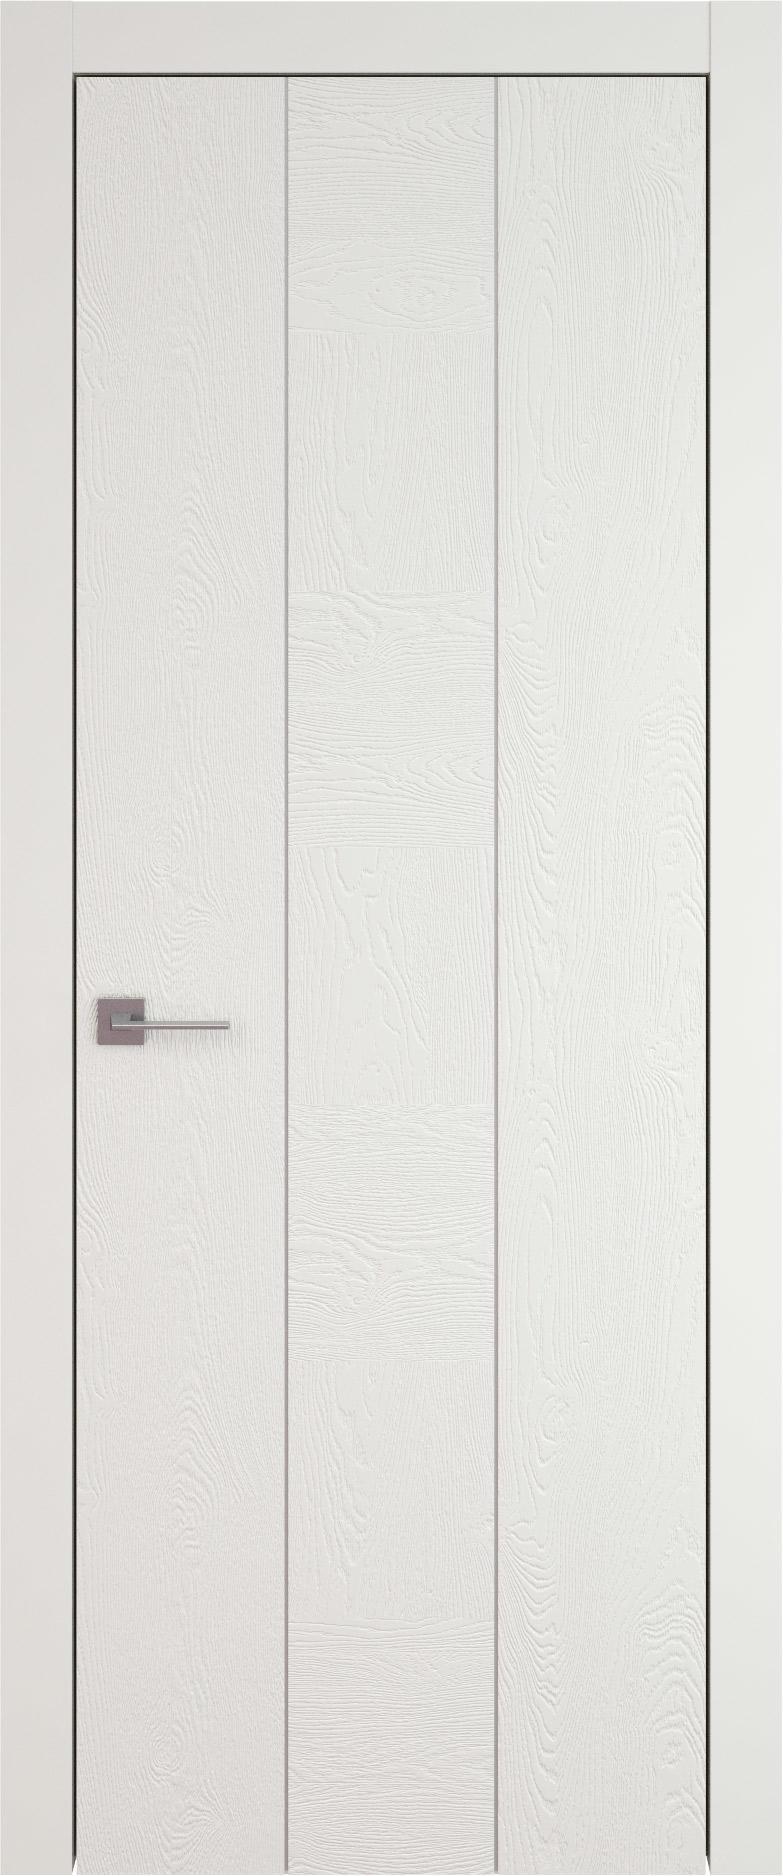 Tivoli Б-1 цвет - Бежевая эмаль по шпону (RAL 9010) Без стекла (ДГ)